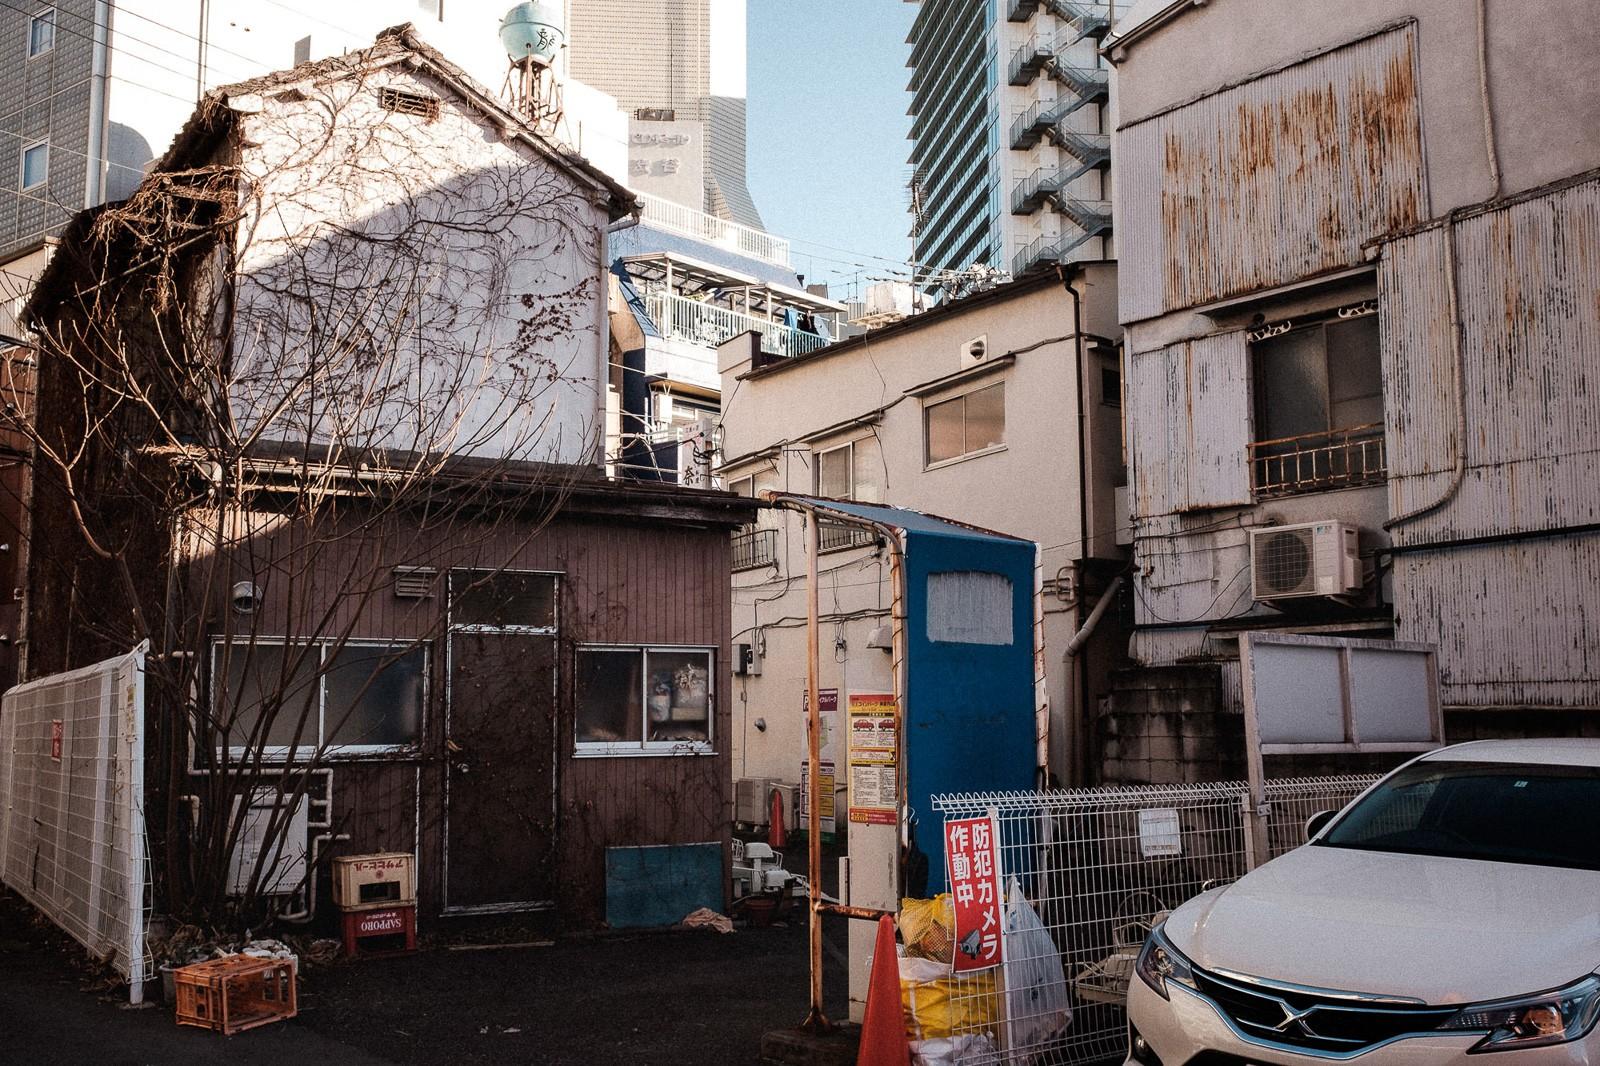 Crowded rooftop in shinsen shibuya